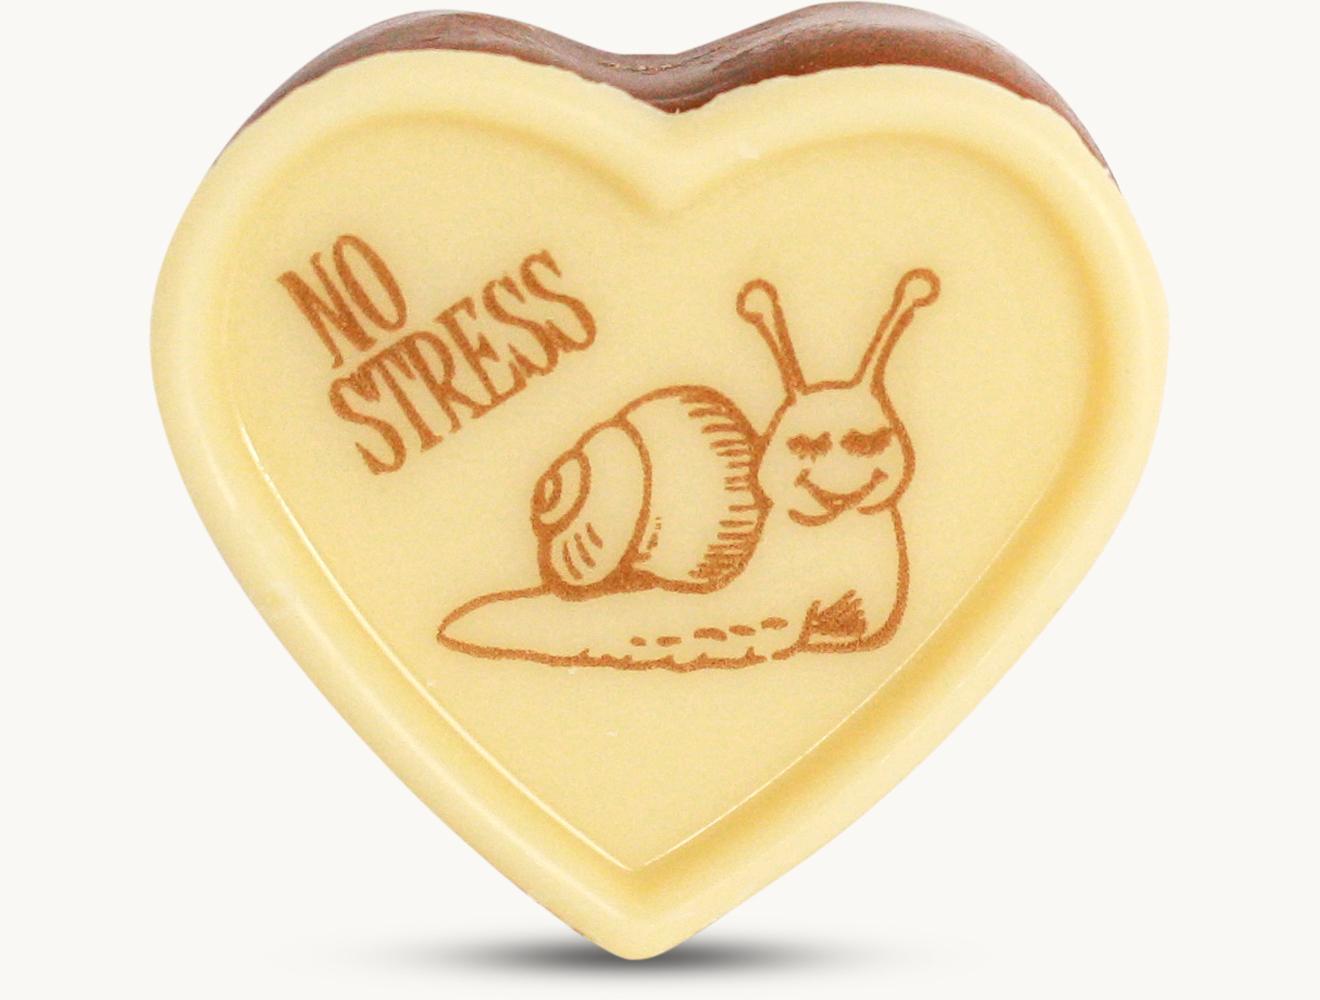 Herzpraline - No Stress